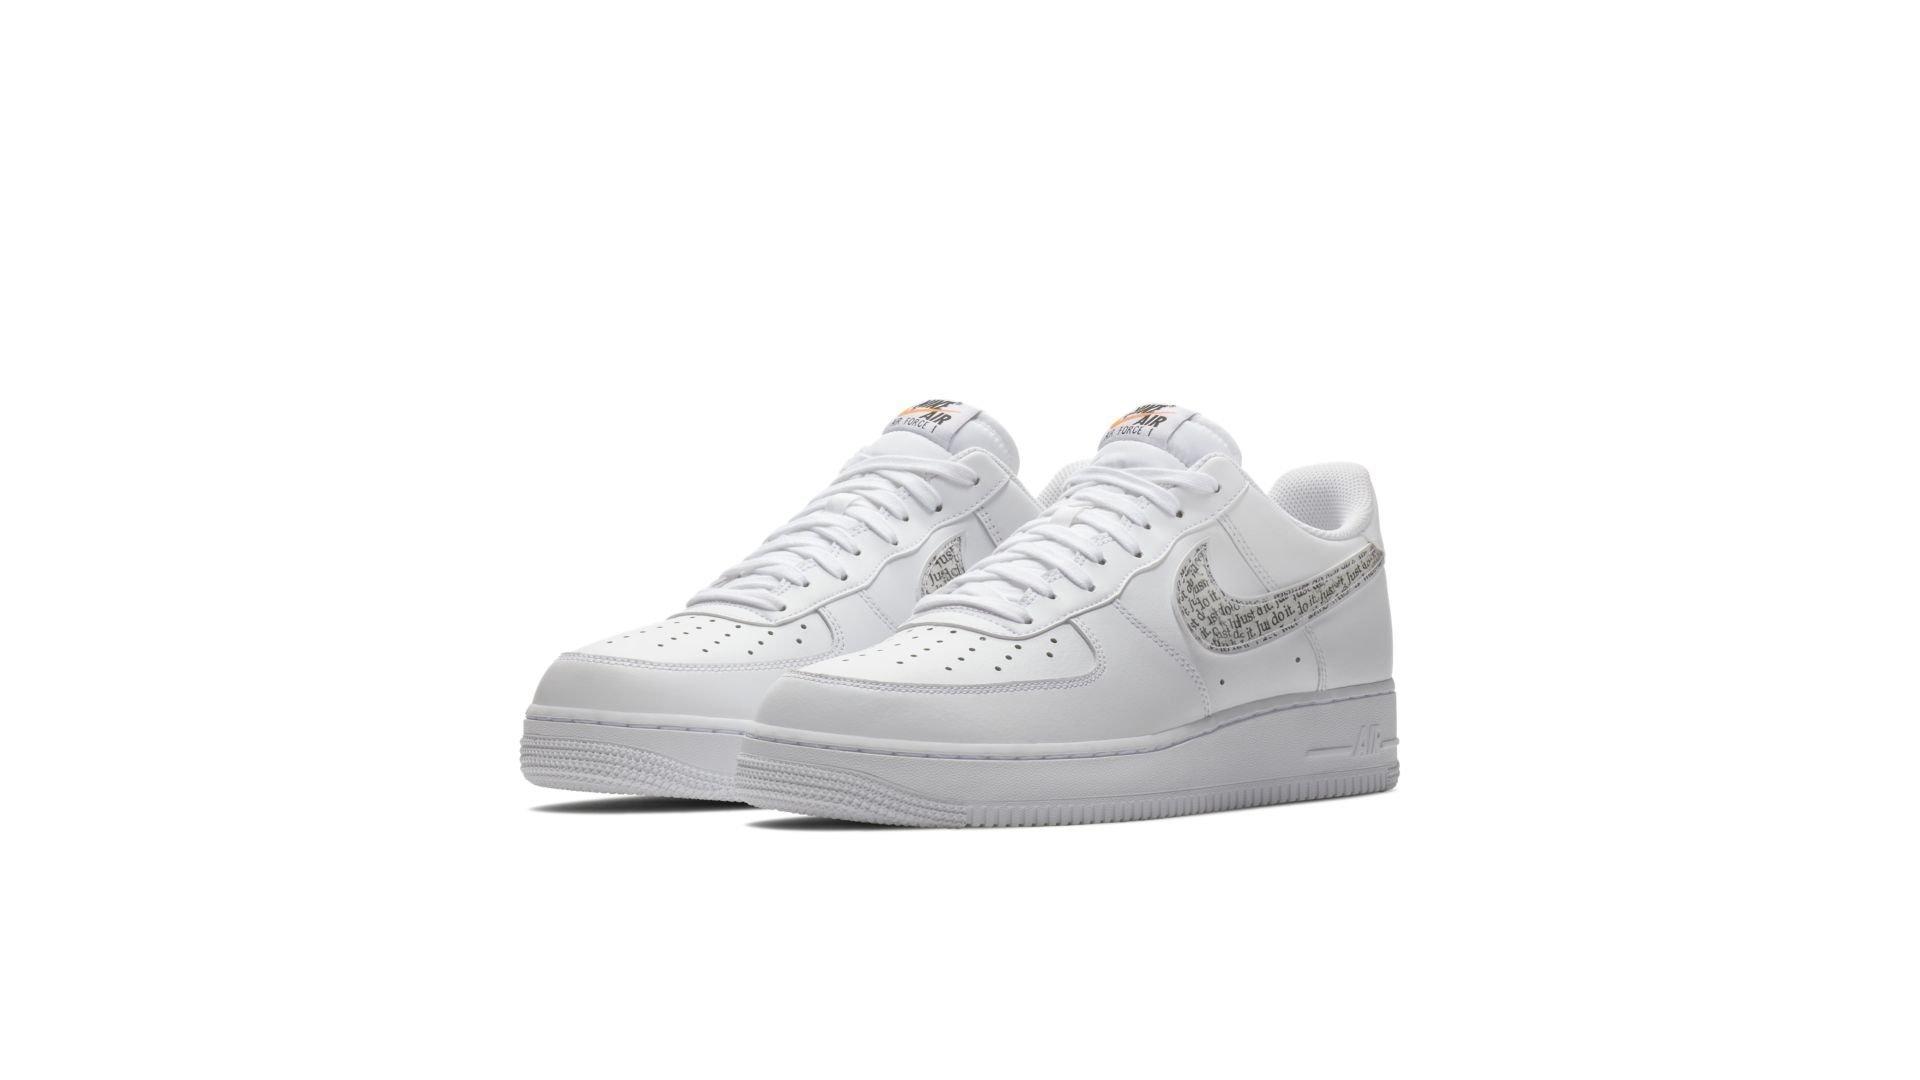 Nike Air Force 1 '07 LV8 'Just Do It' (BQ5361-100)